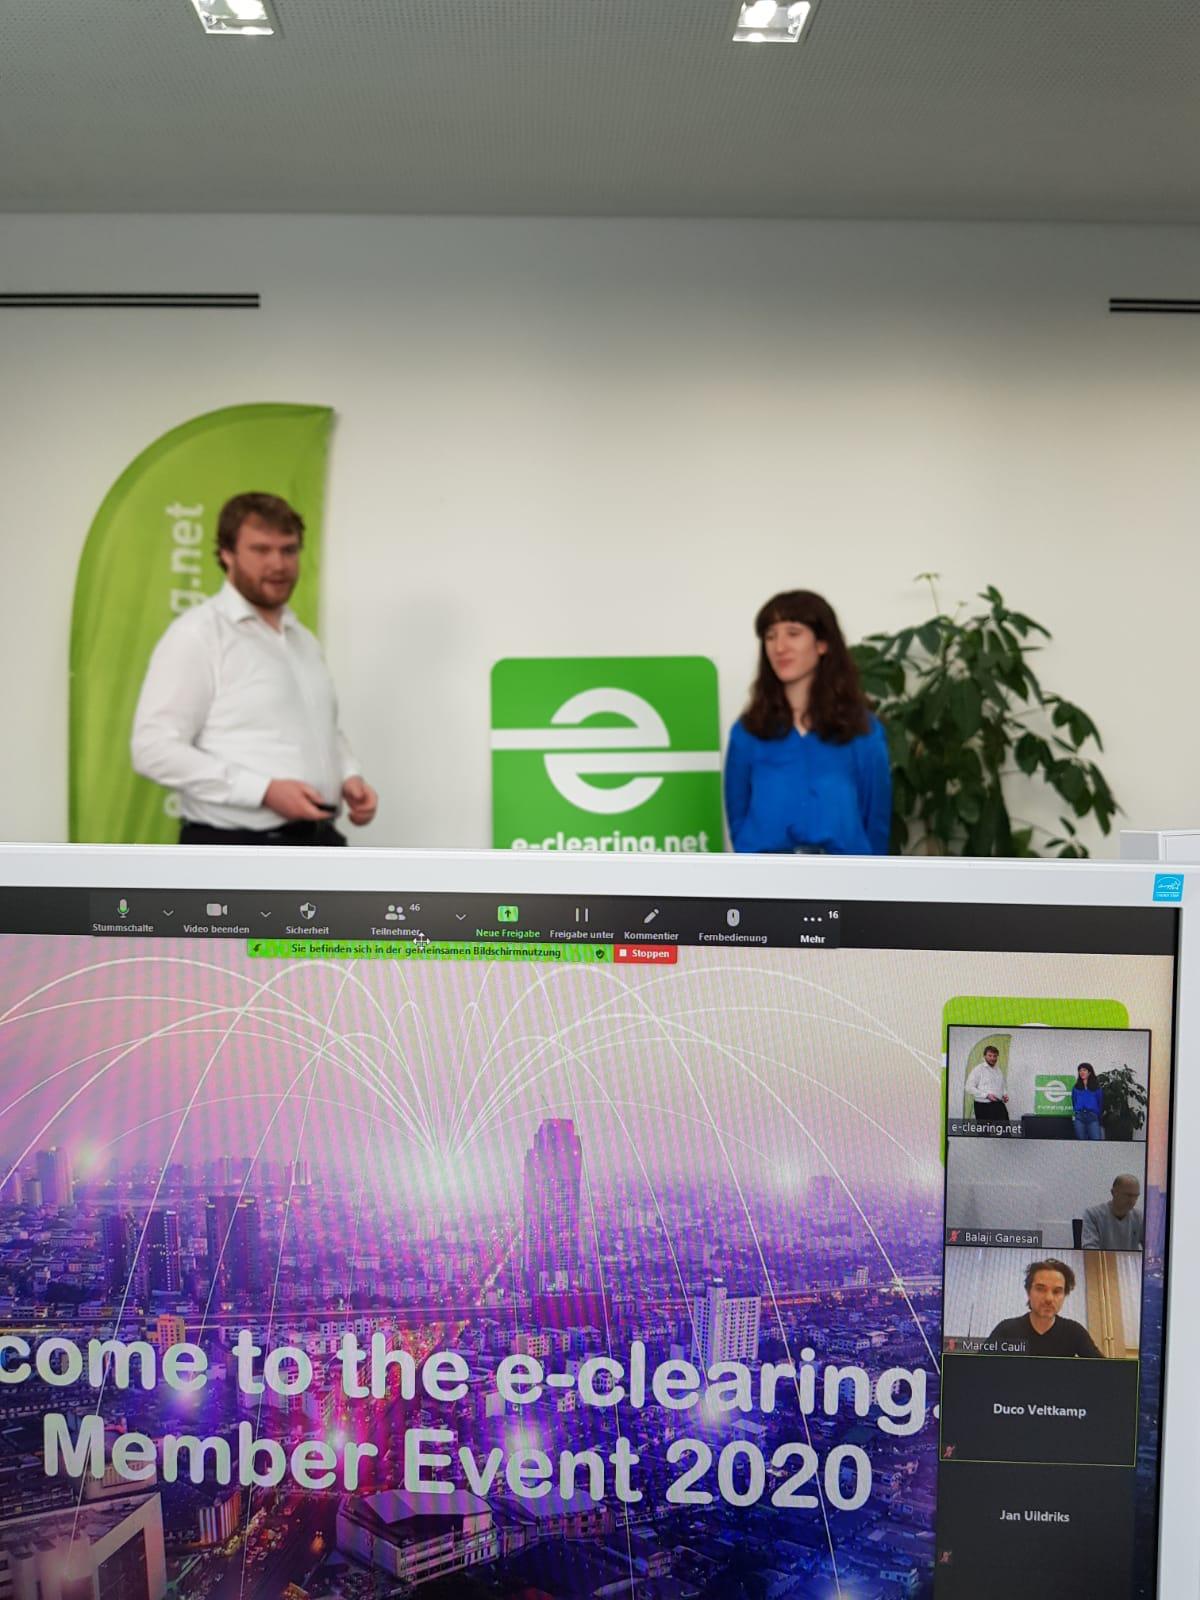 Successfull online member event with historic milestones